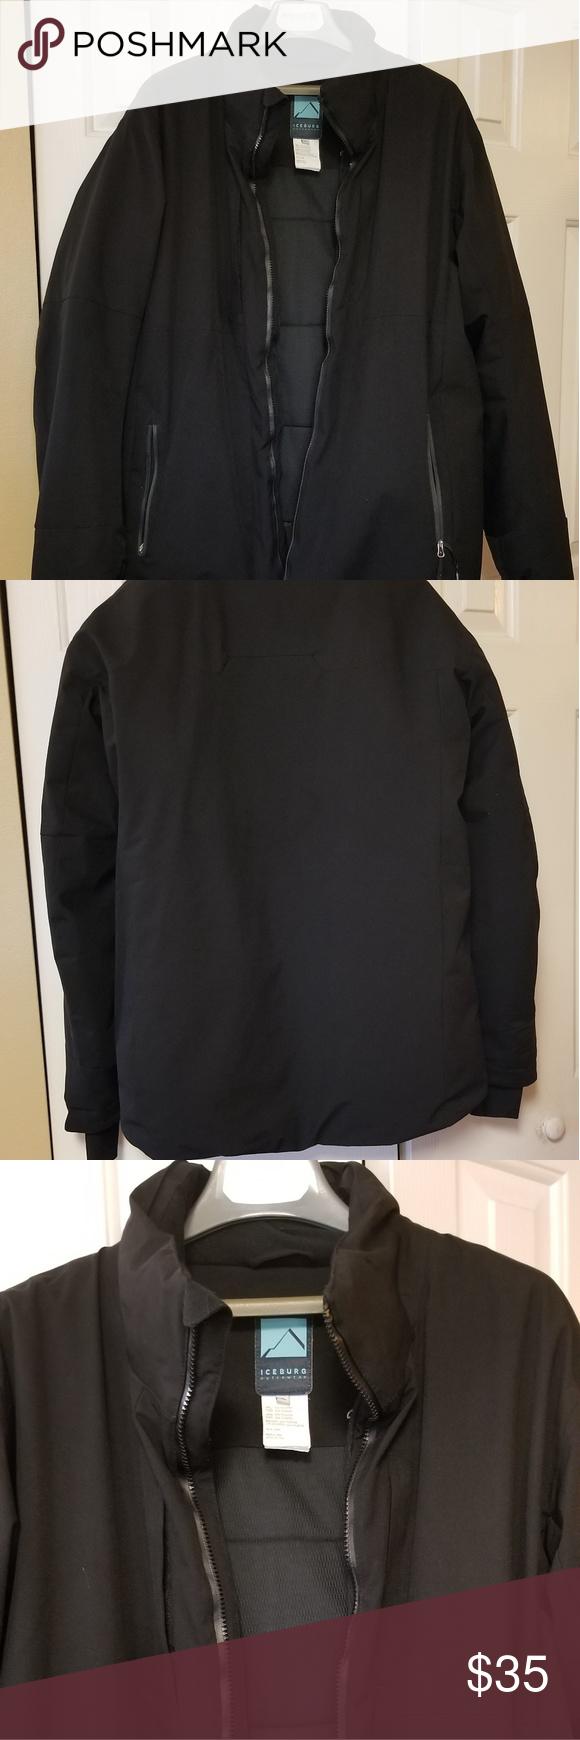 Iceberg Outerwear Winter Jacket Jackets Winter Jackets Warm Winter Jackets [ 1740 x 580 Pixel ]